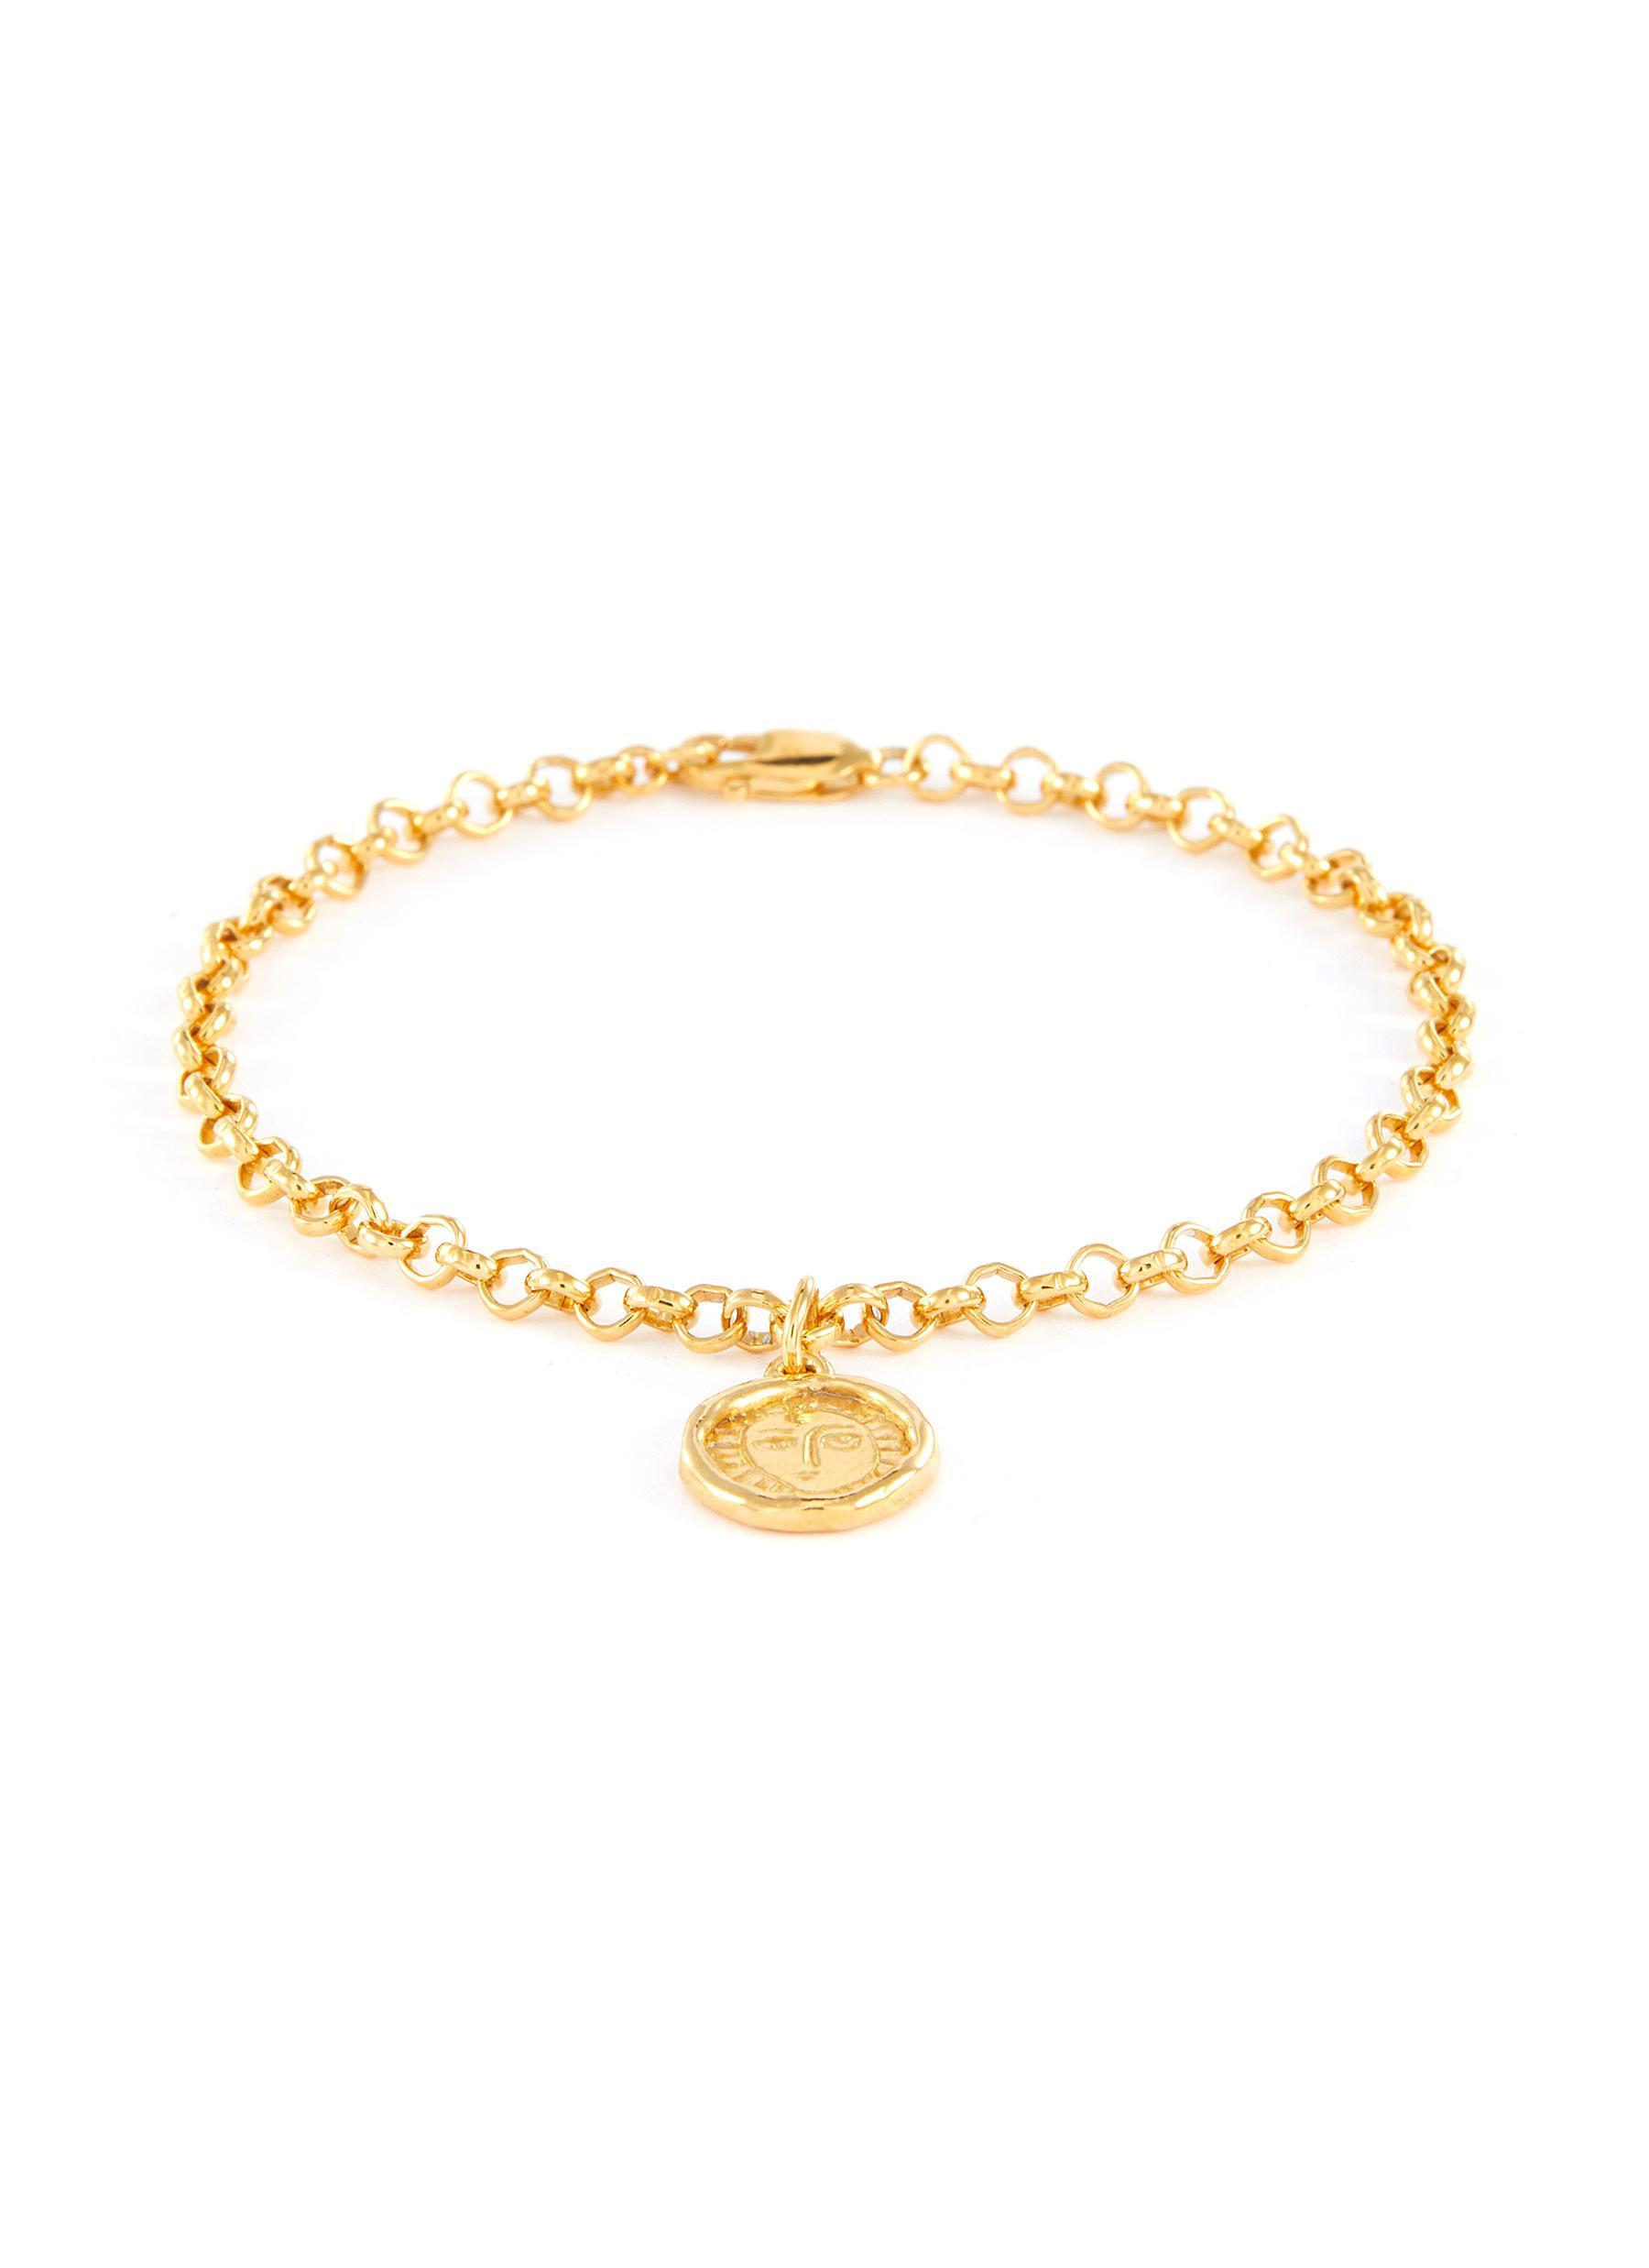 Holly Ryan 'picasso' Charm Bracelet